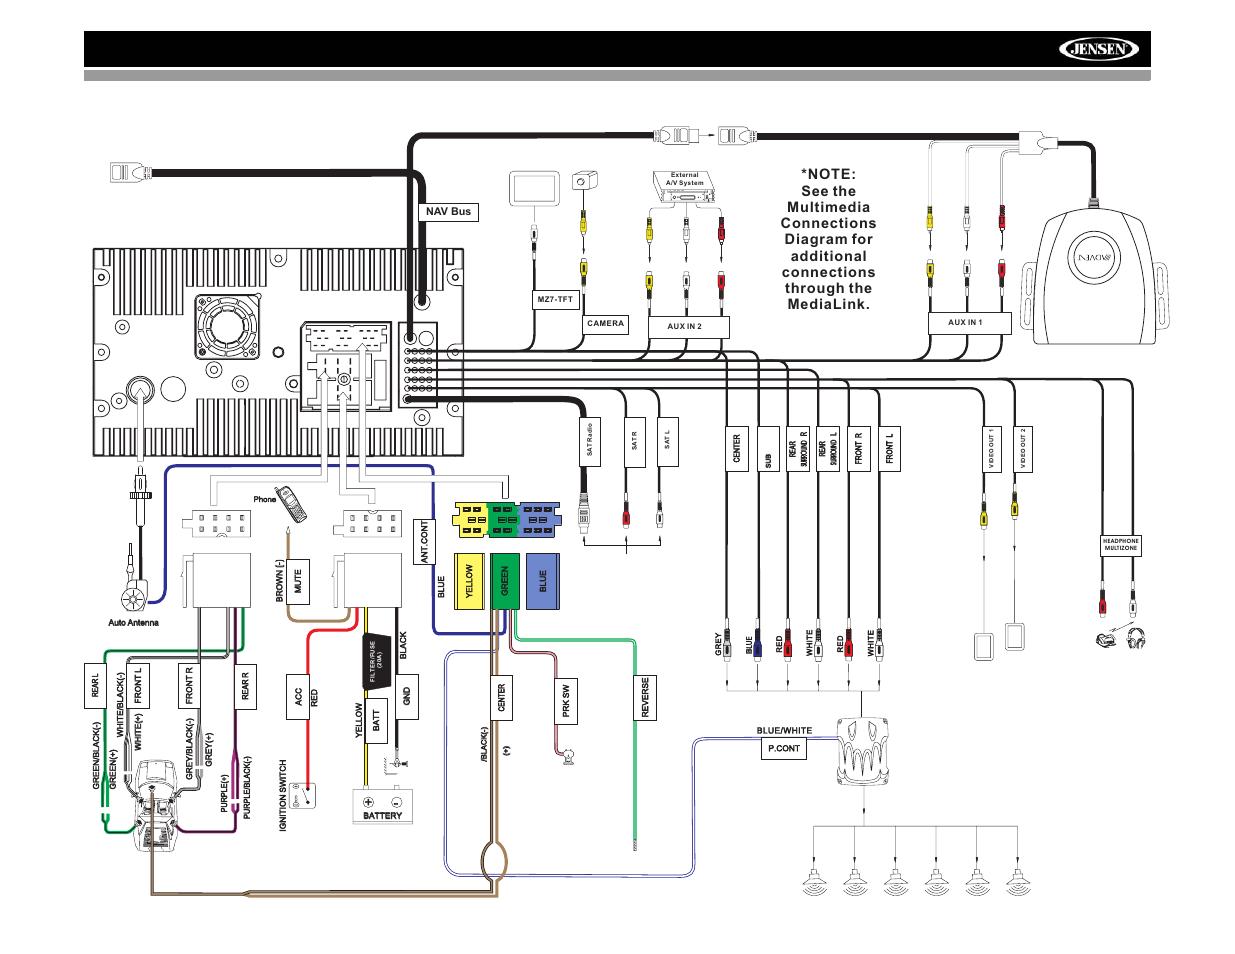 Amm12n   Advent AMM12N User Manual   Page 7 / 44   Advent Wiring Diagram      manualsdir.com